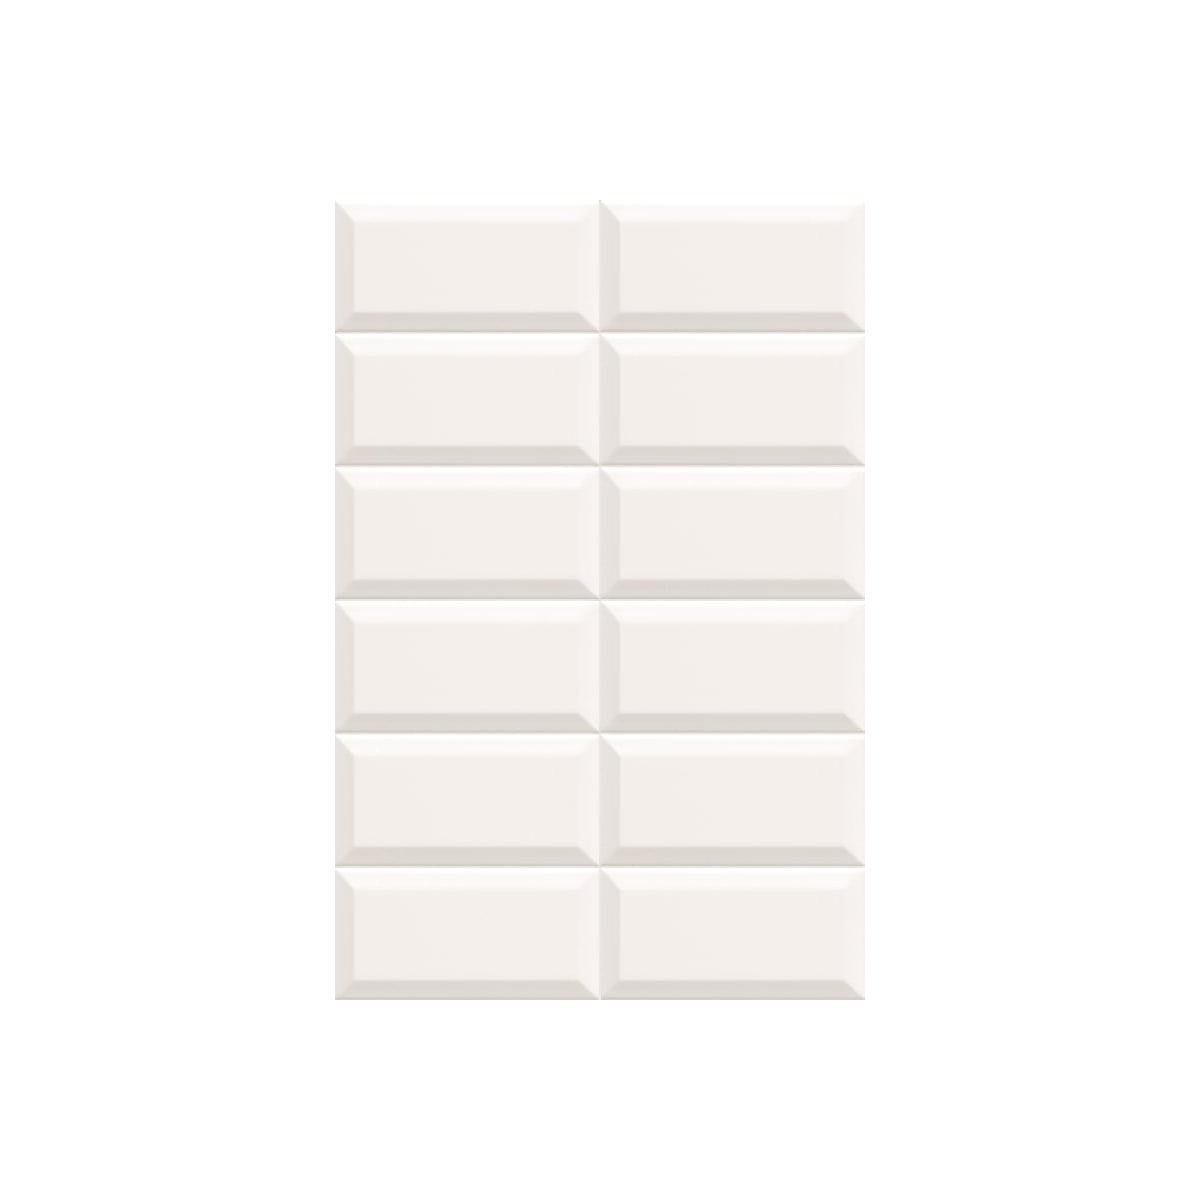 Bissel Blanco Mate 10x20 (m2)